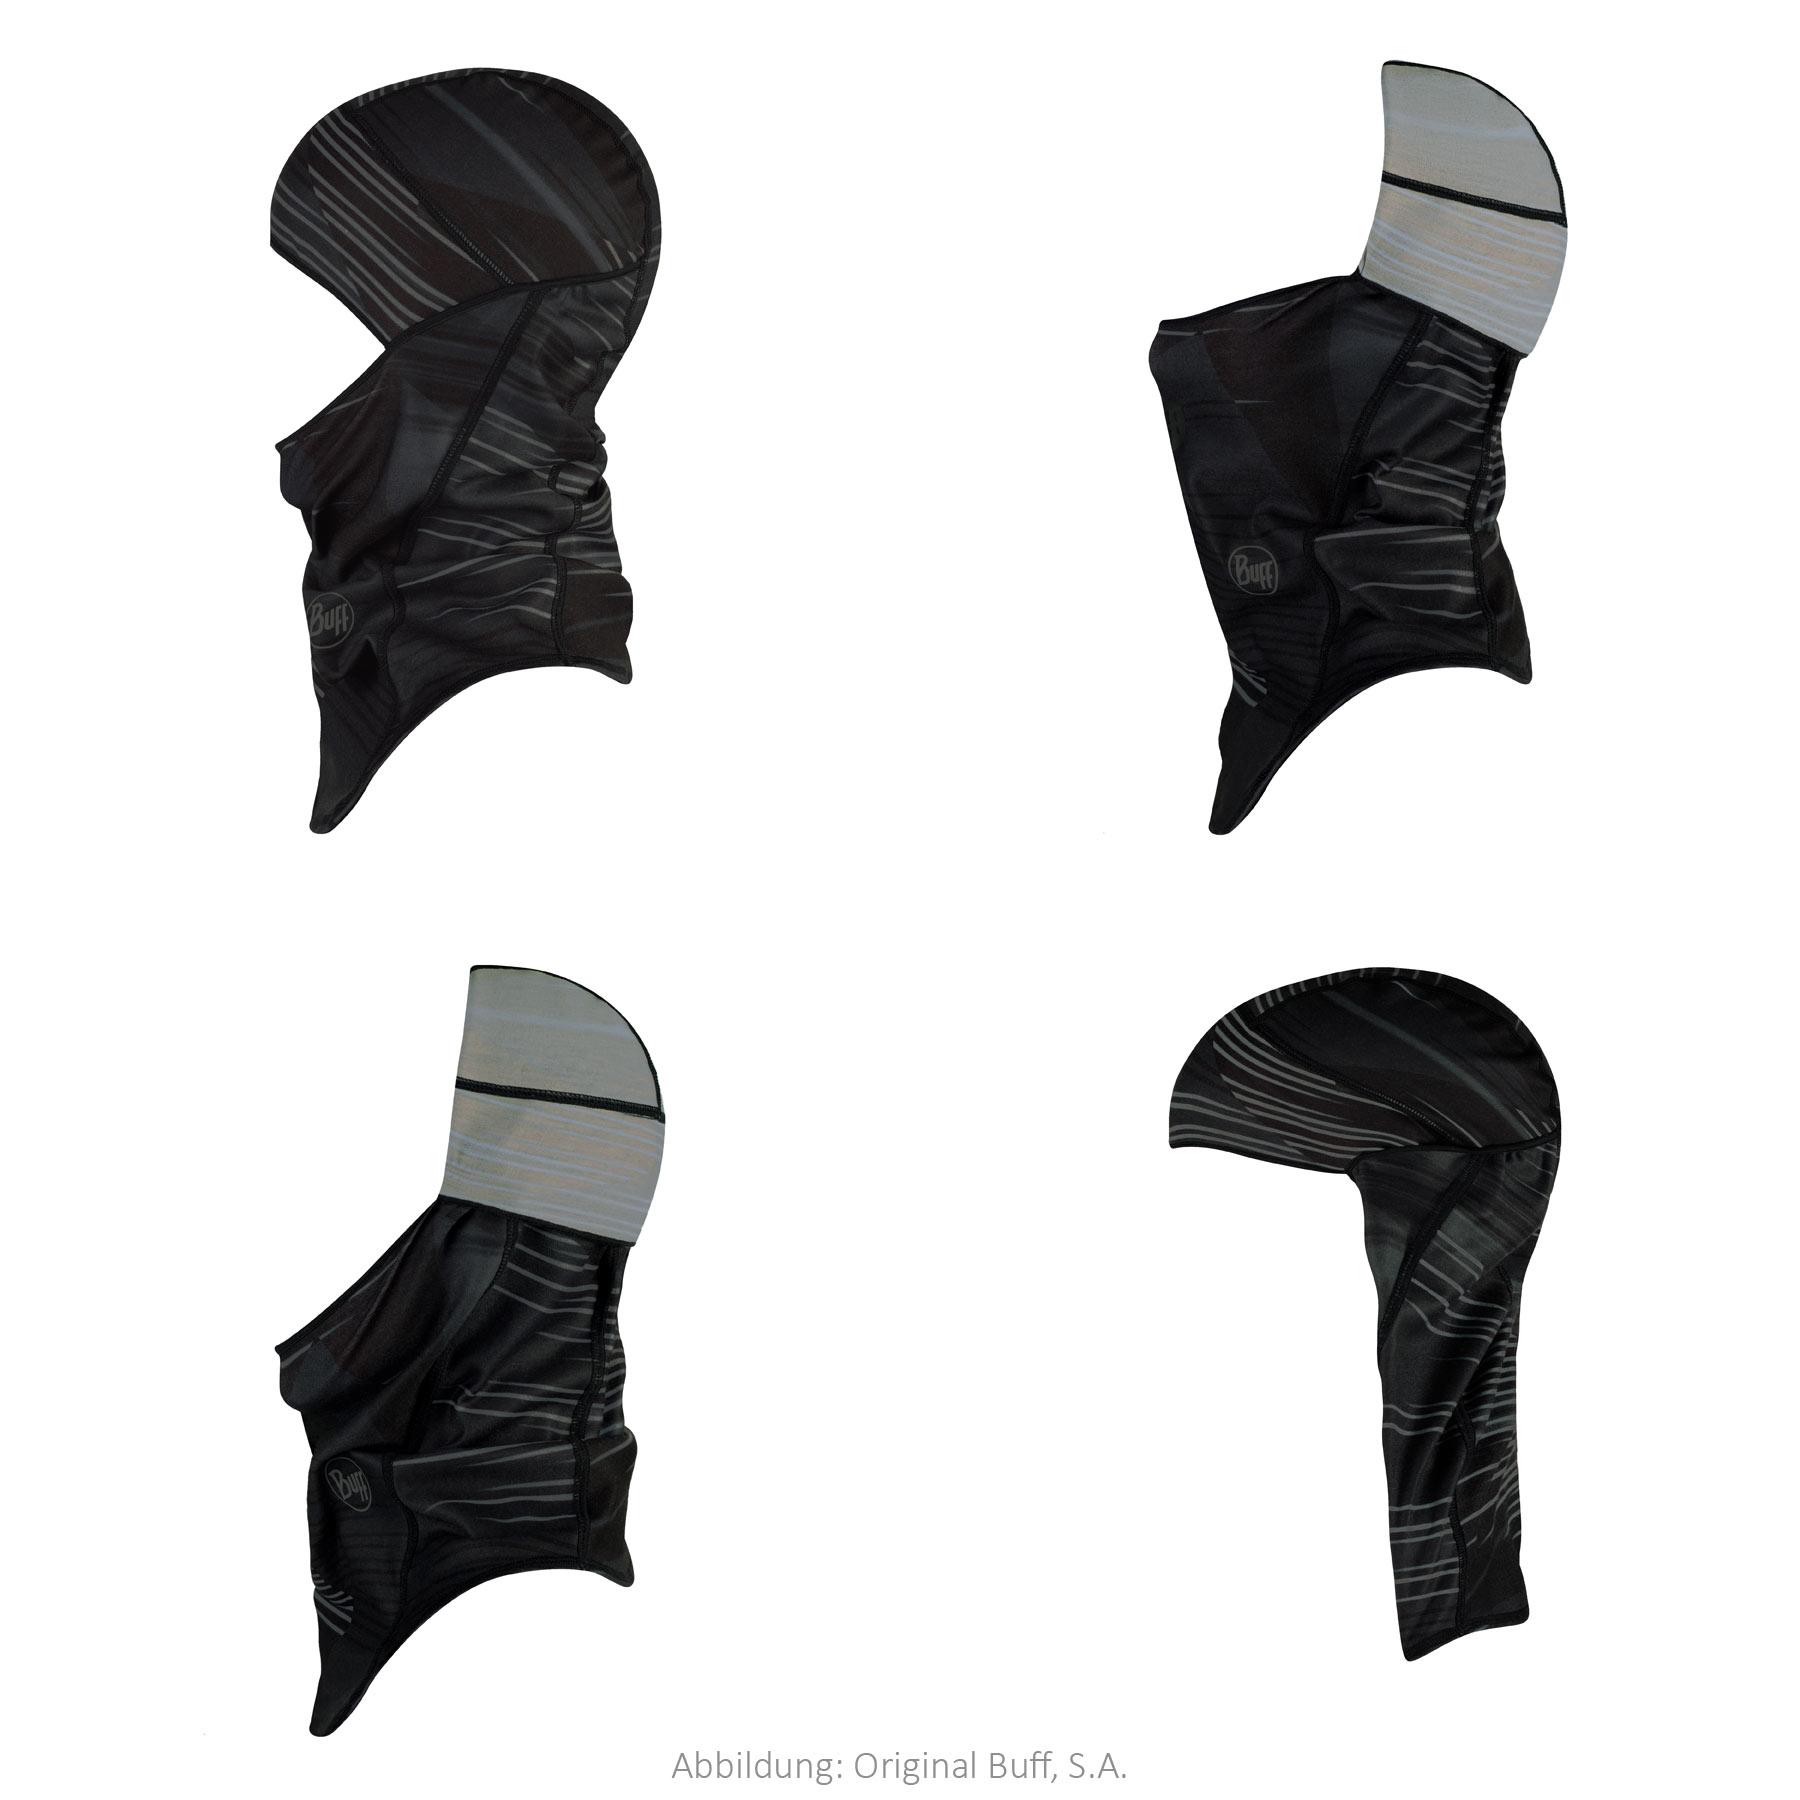 Image of Buff® ThermoNet® Hinged Balaclava - Refik Black